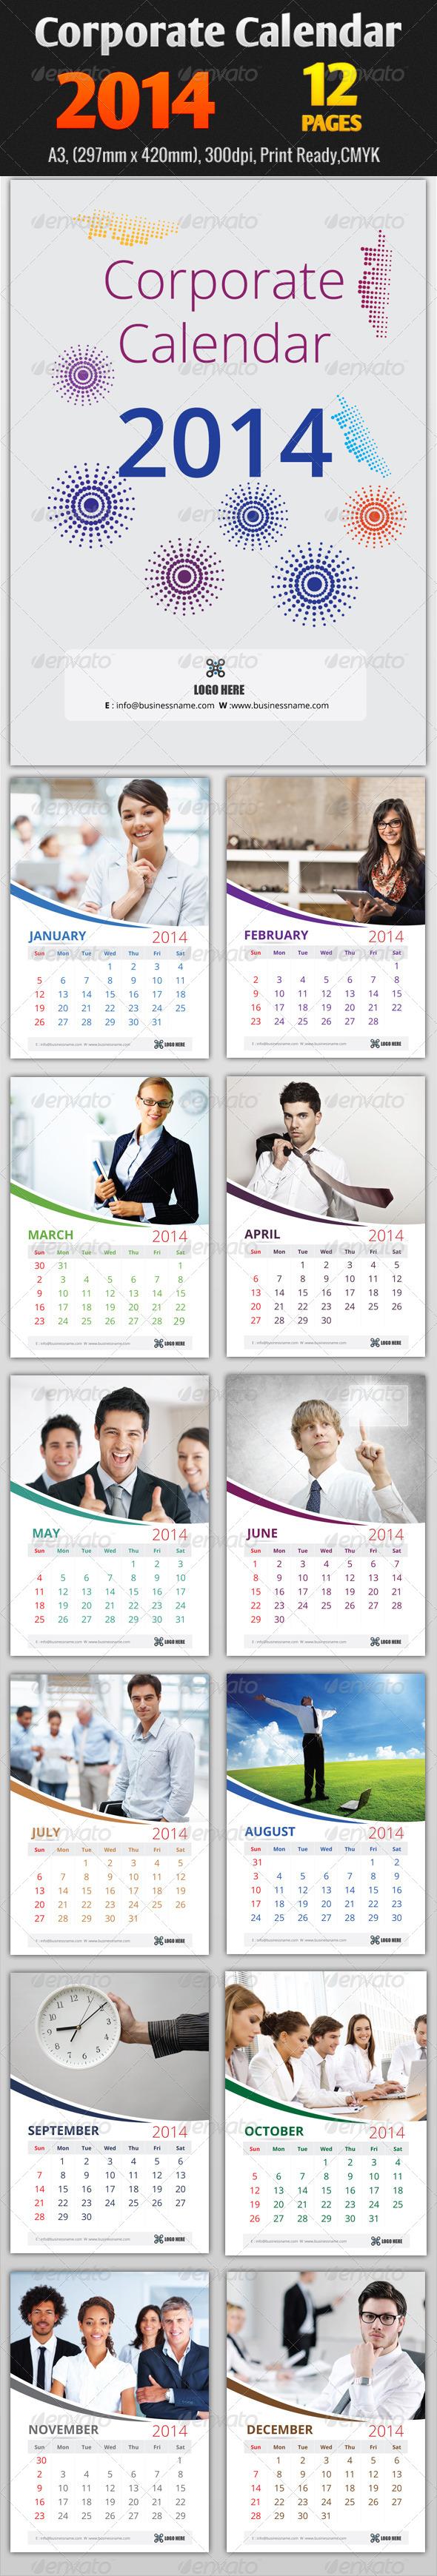 Corporate Calendar 2014 Templates - Calendars Stationery